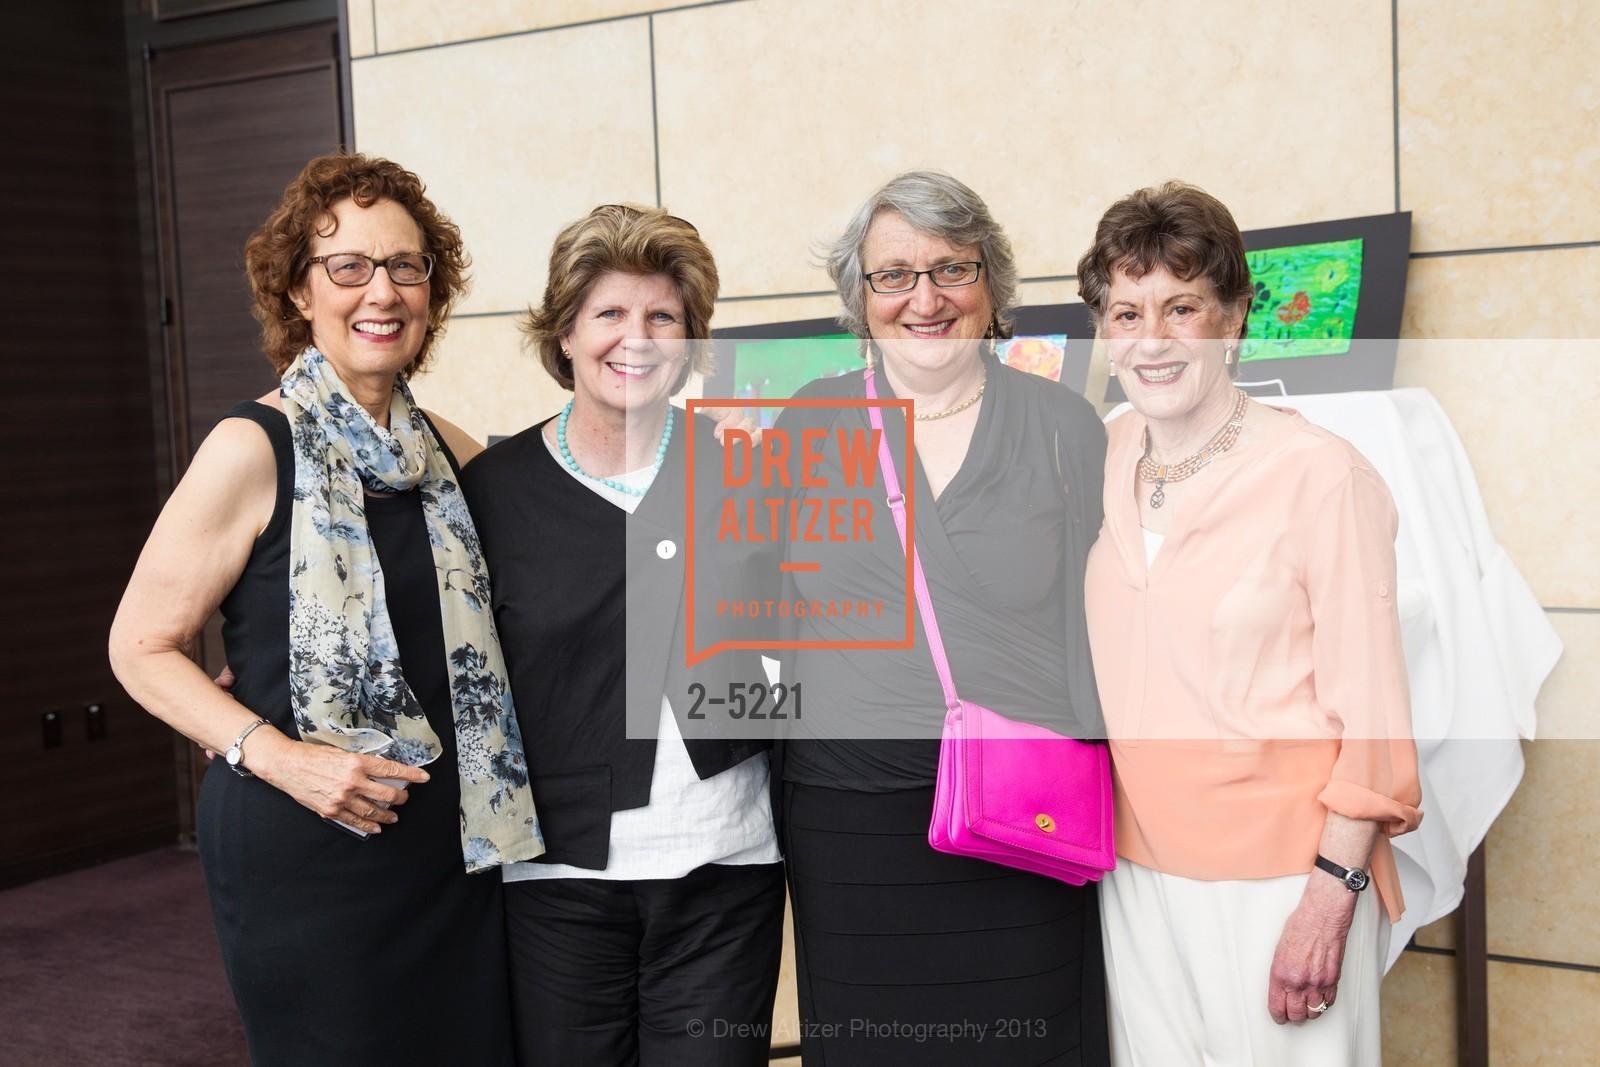 Susan Gefter, Kathleen Andreson, Ann Kirk, Gail Nebenzahl, Photo #2-5221